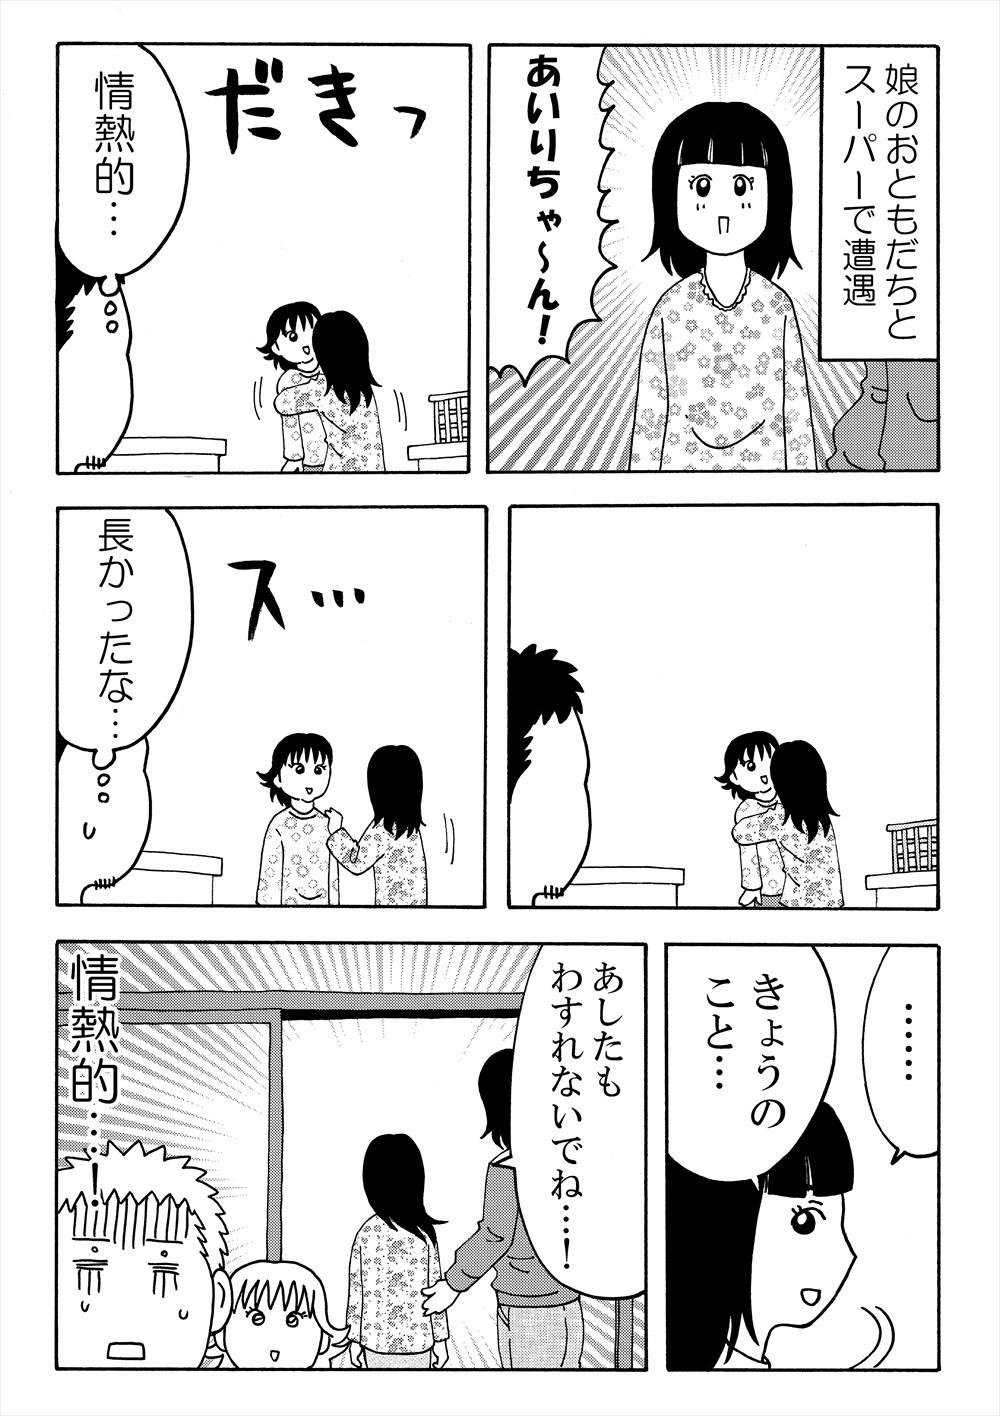 yokoyamake10wa_R